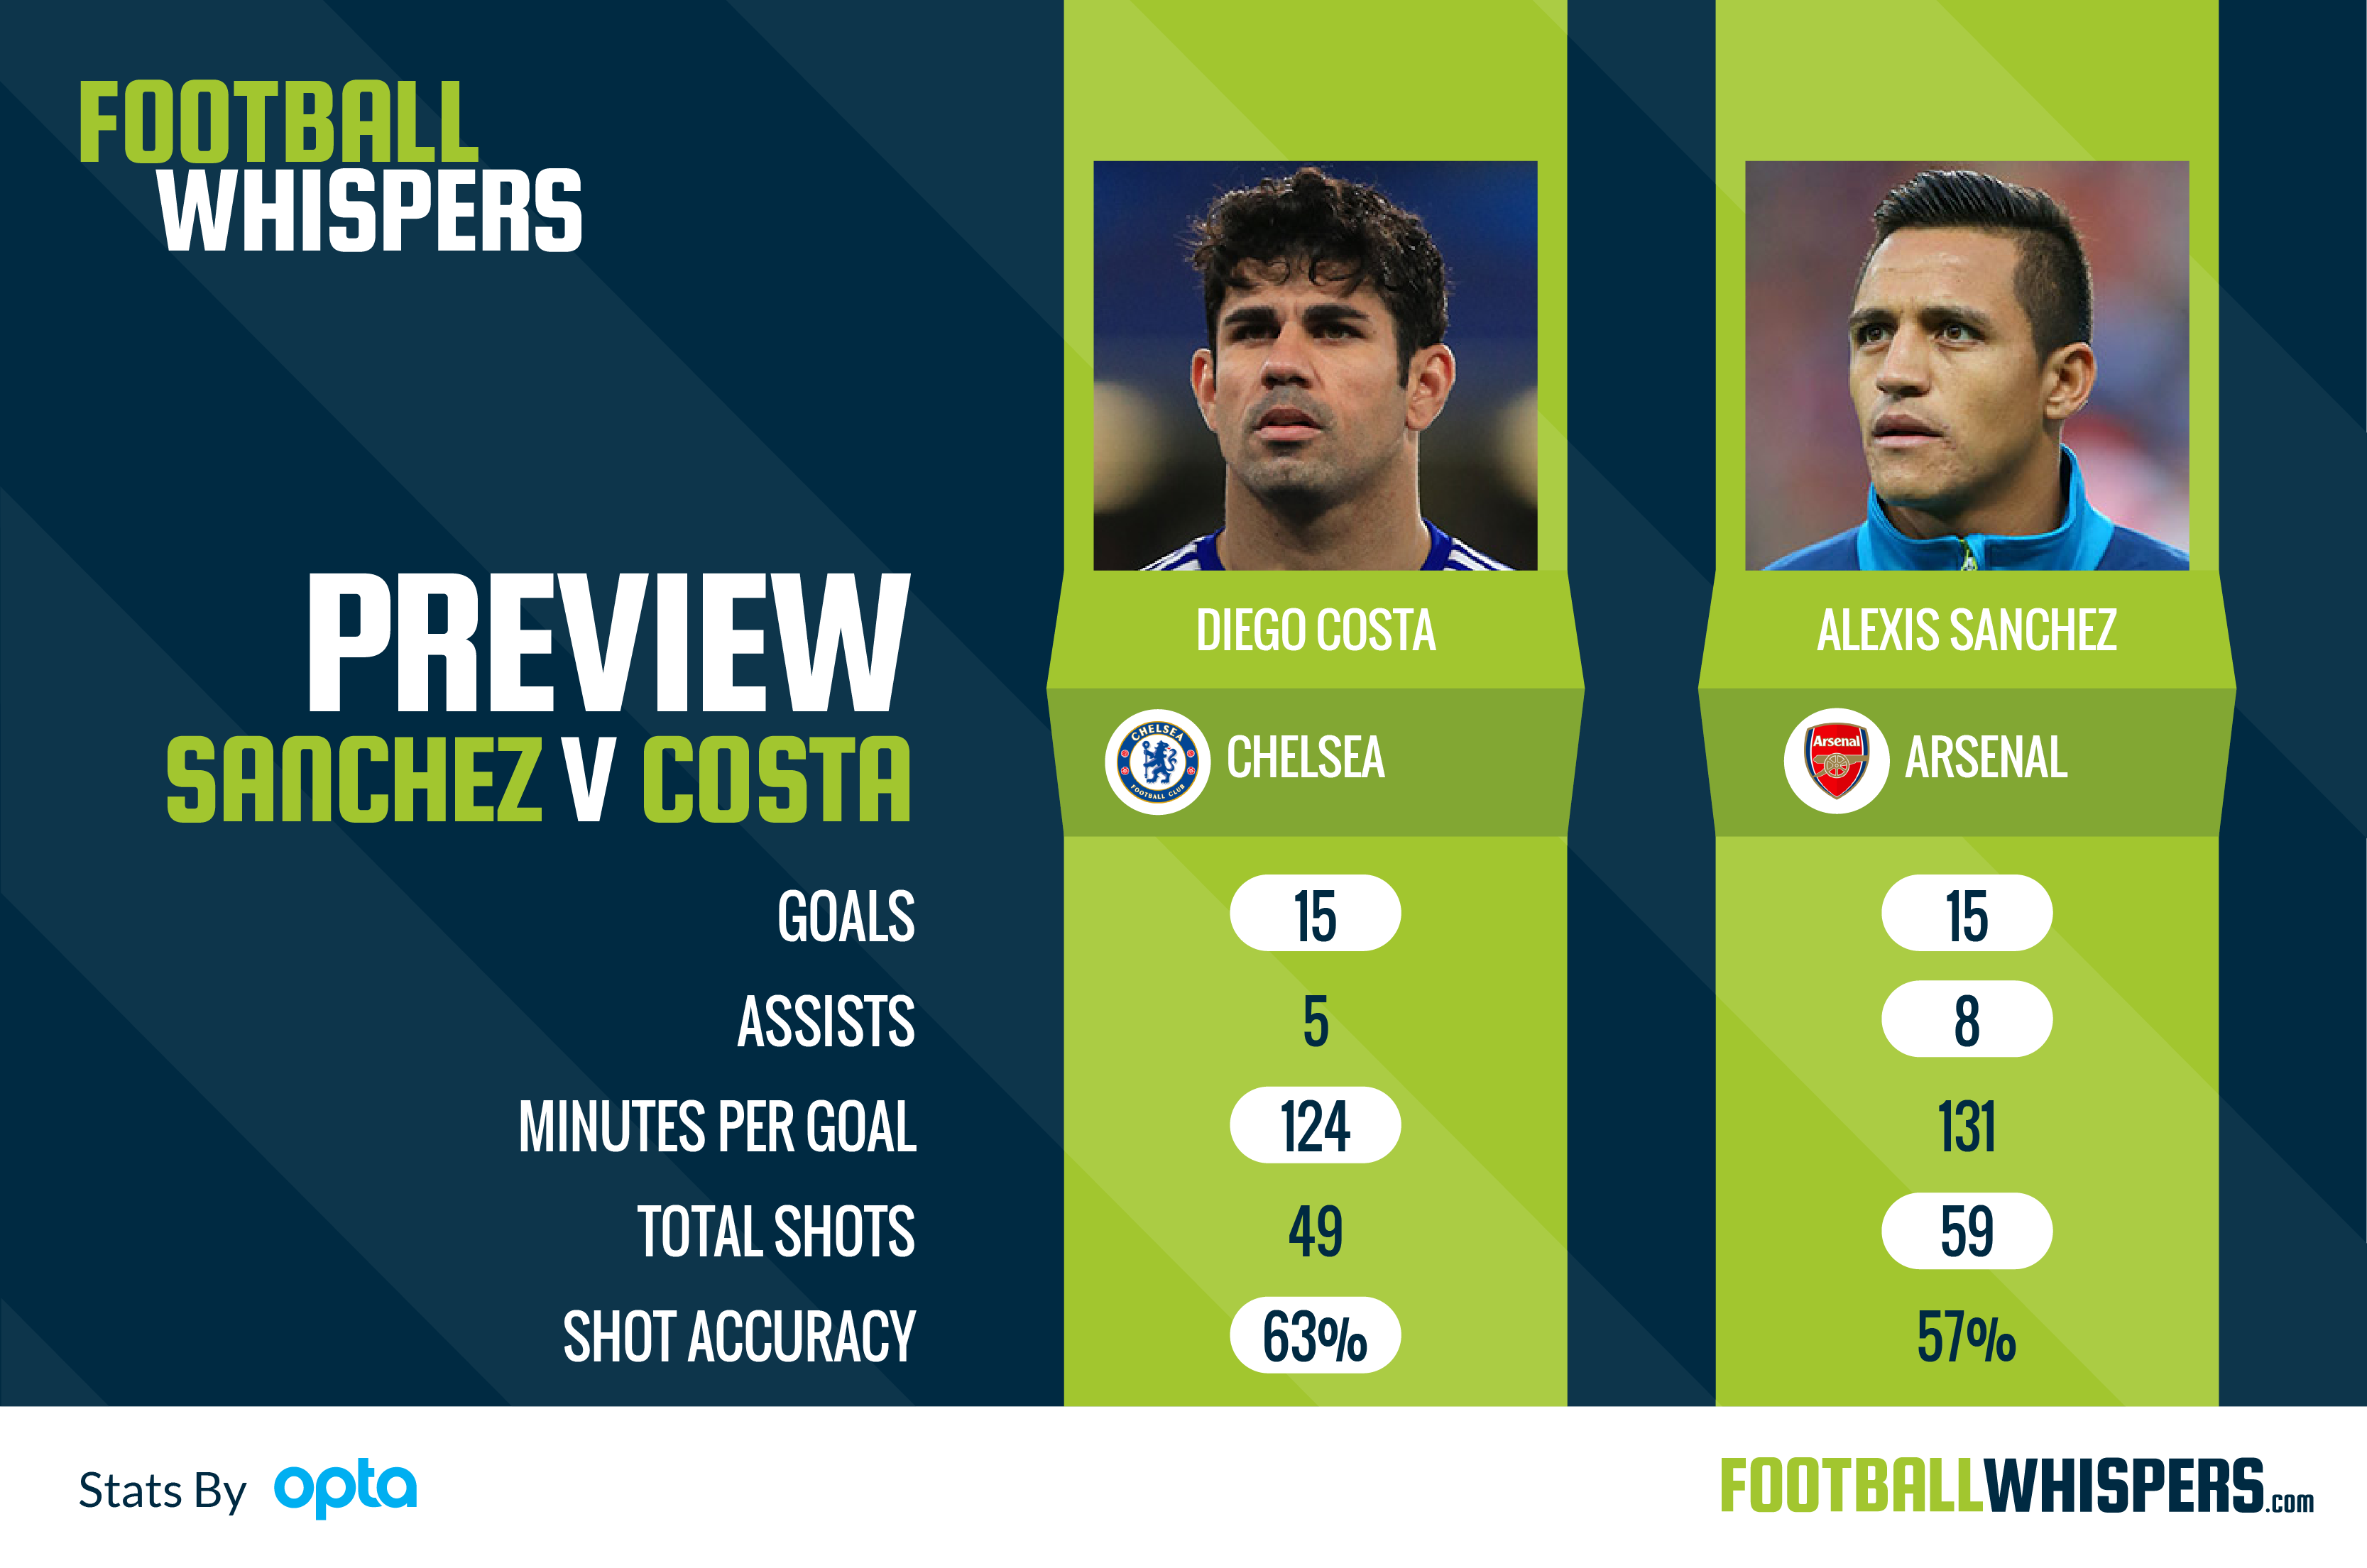 Diego Costa v Alexis Sanchez comparison